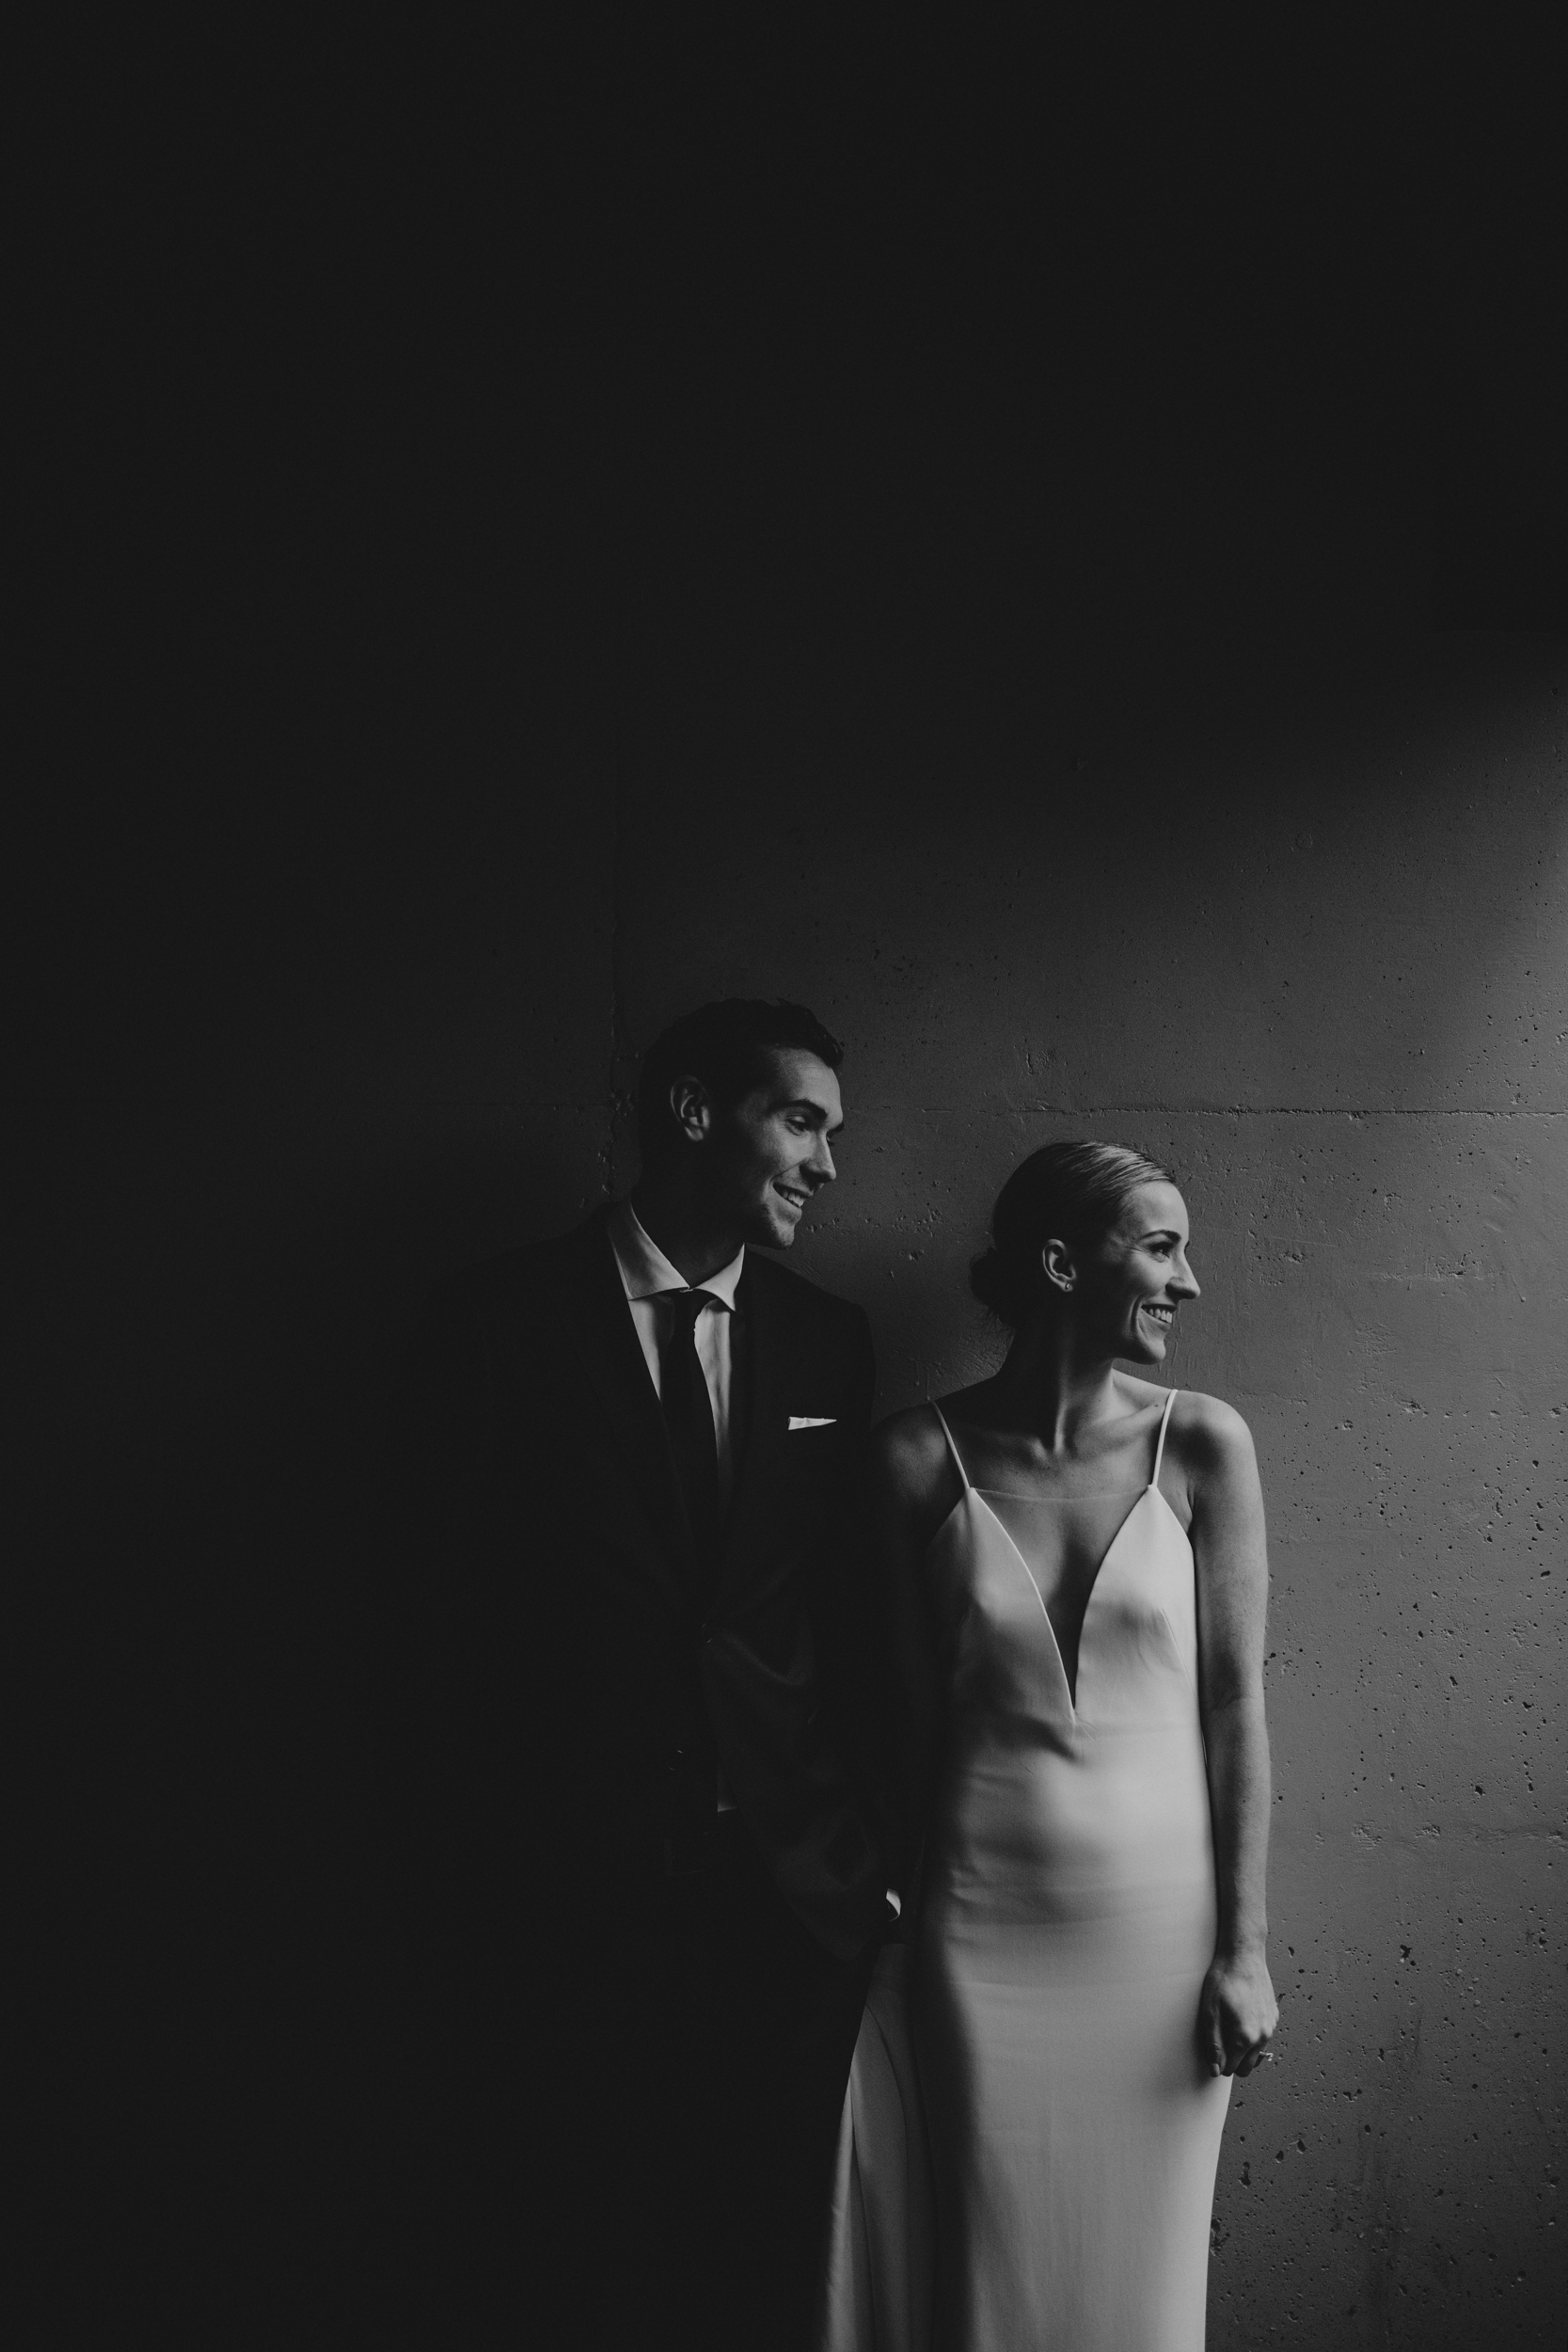 Earls-Loft-City-Vancouver-Wedding-16.jpg